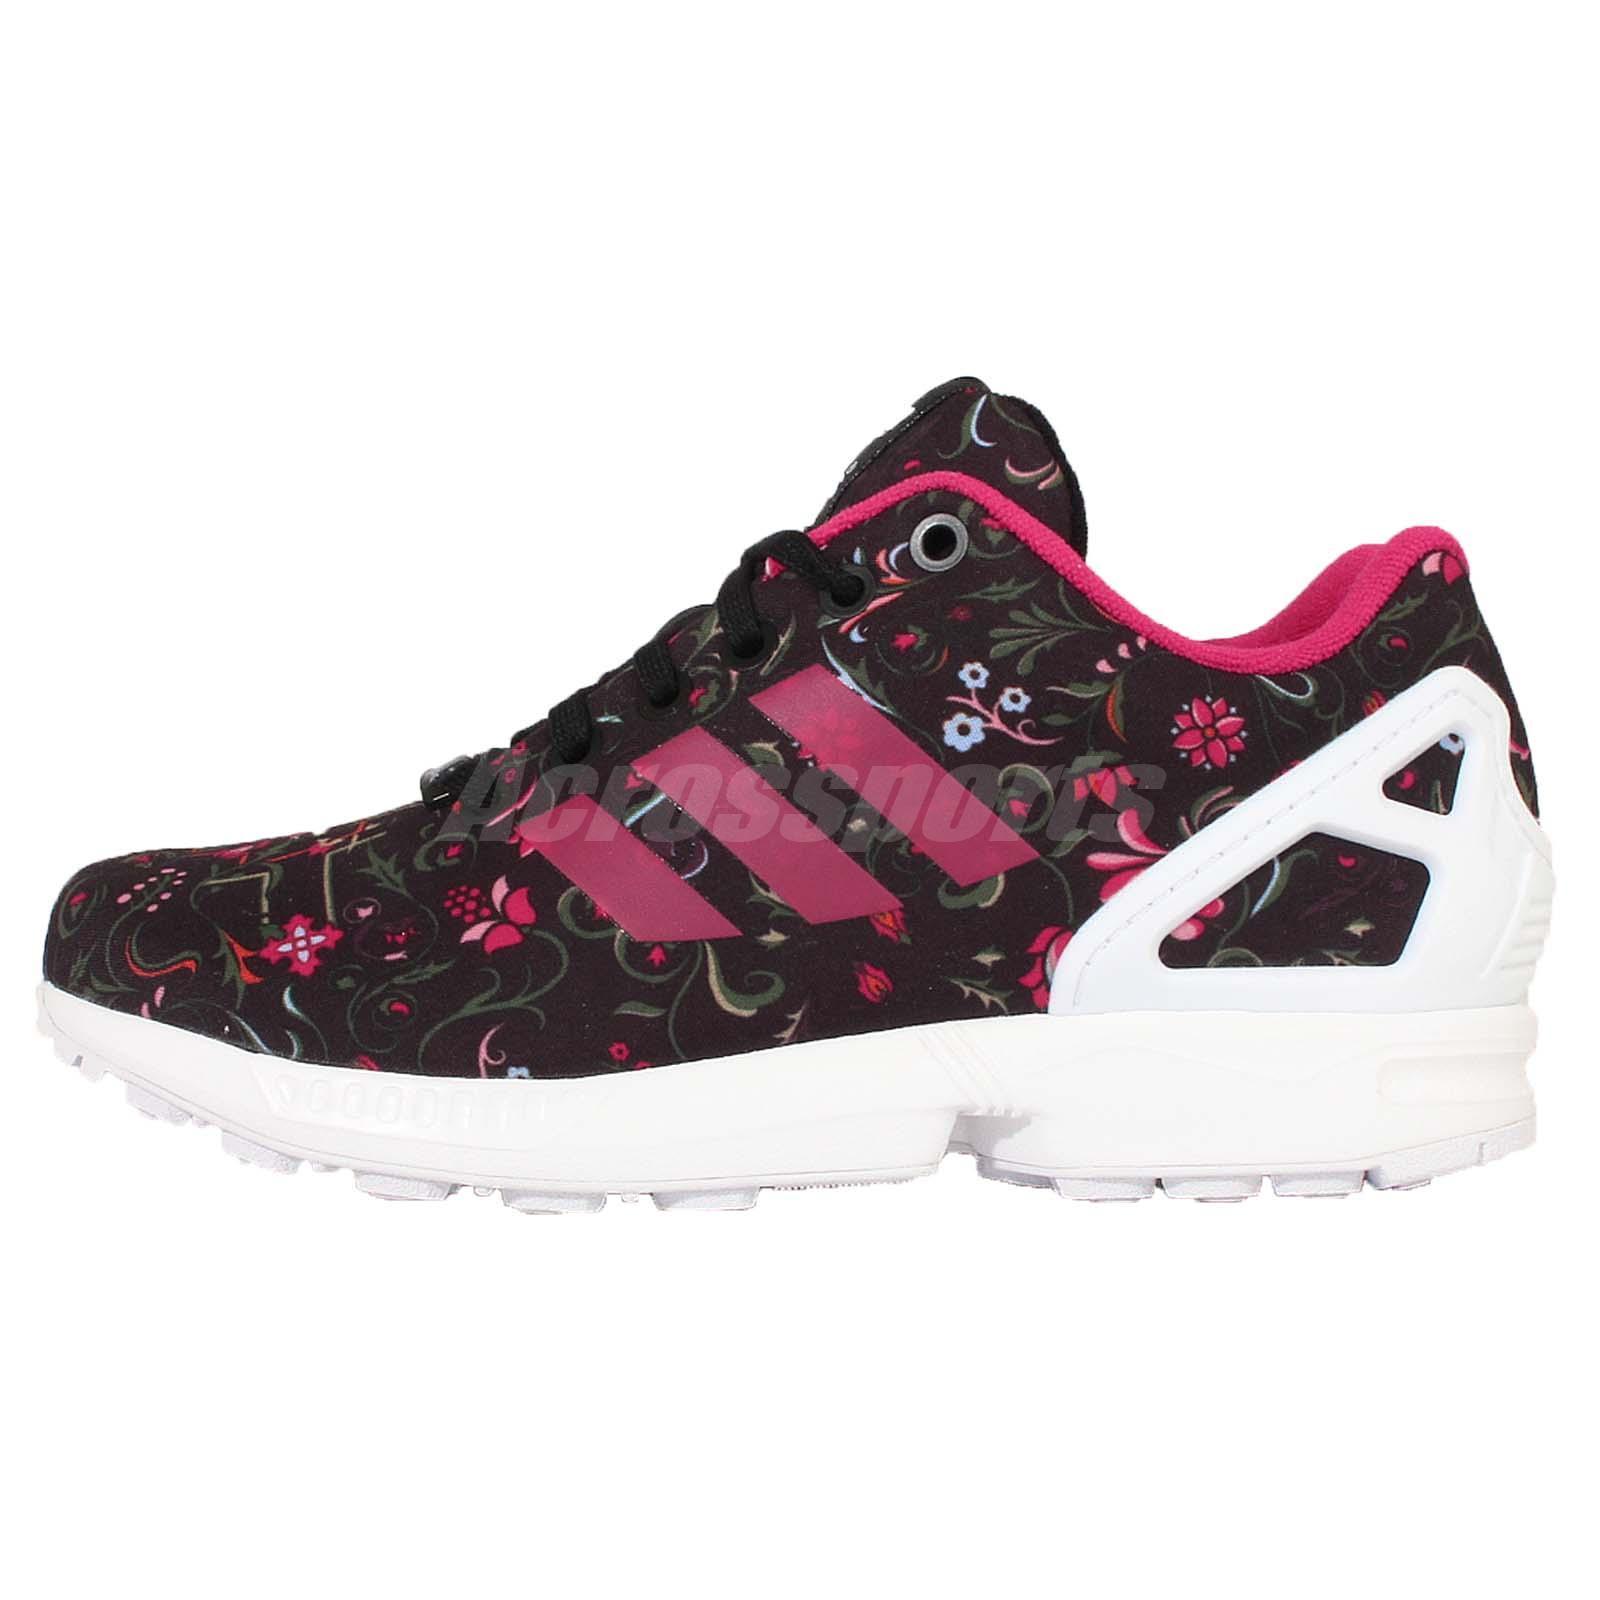 Adidas Flux Floral Pink